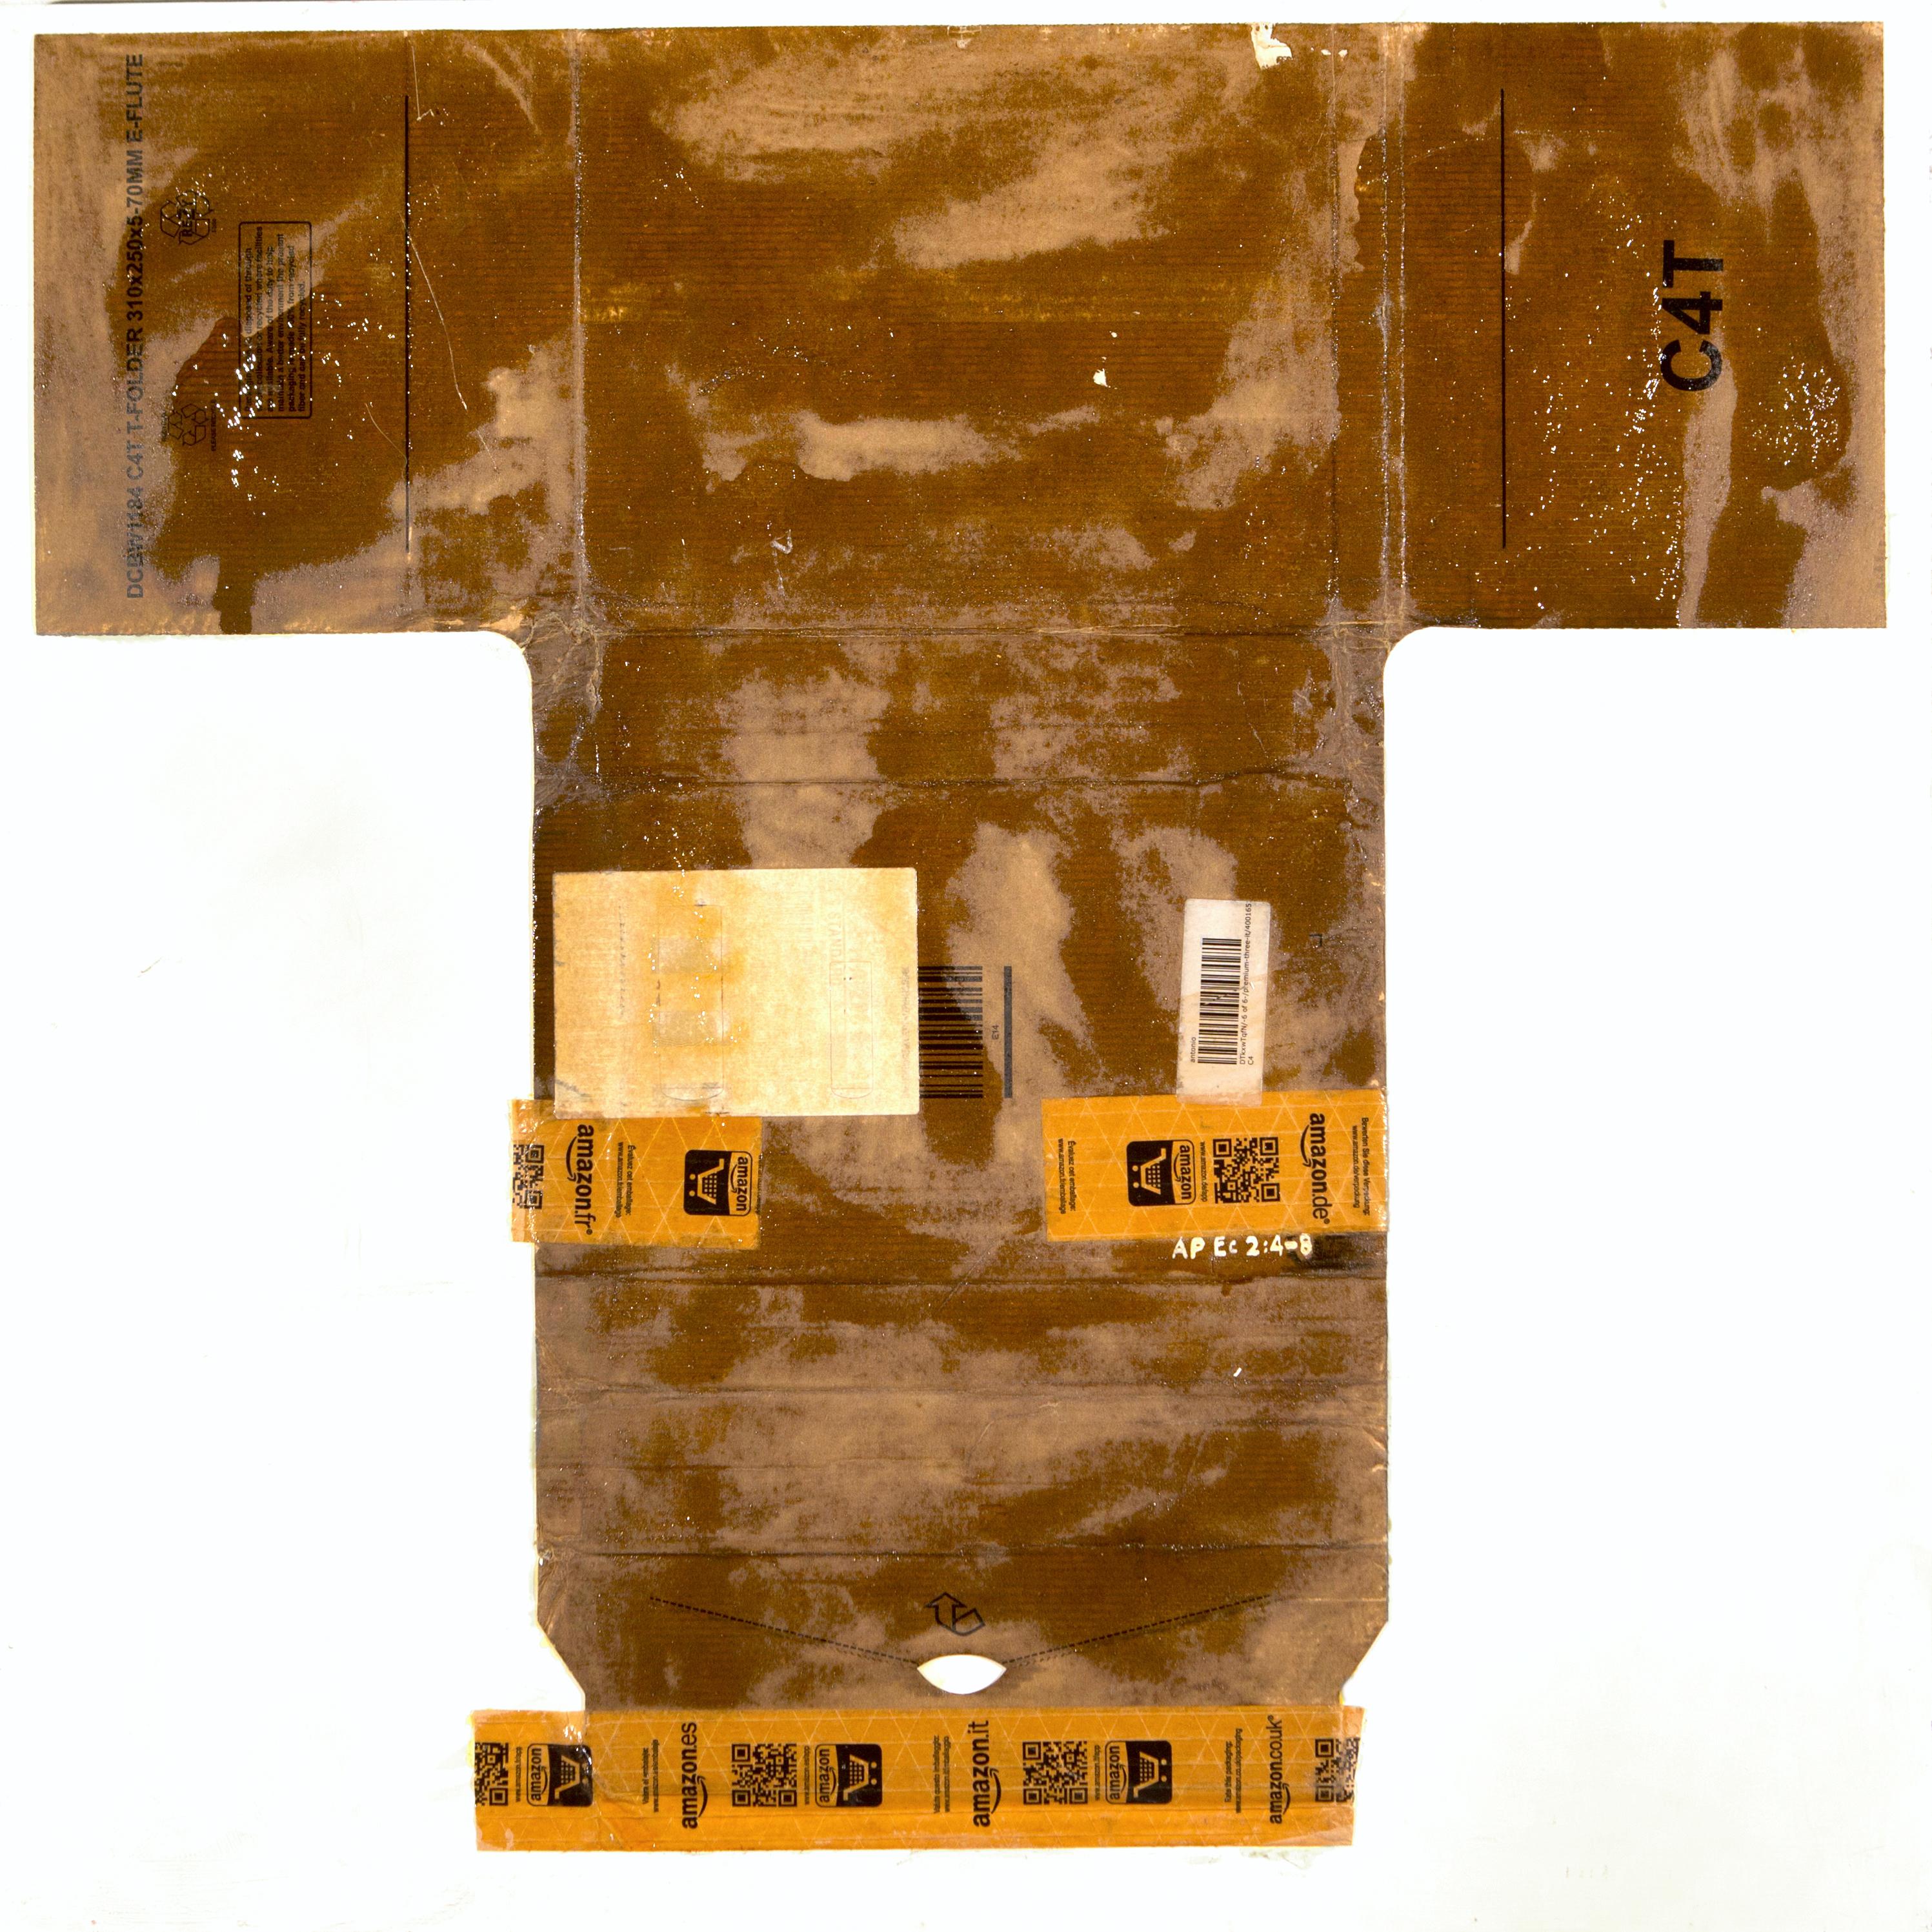 AP Ec 2_4-8, 2015, tecnica mista, cartone su tavola, cm 80 x 80